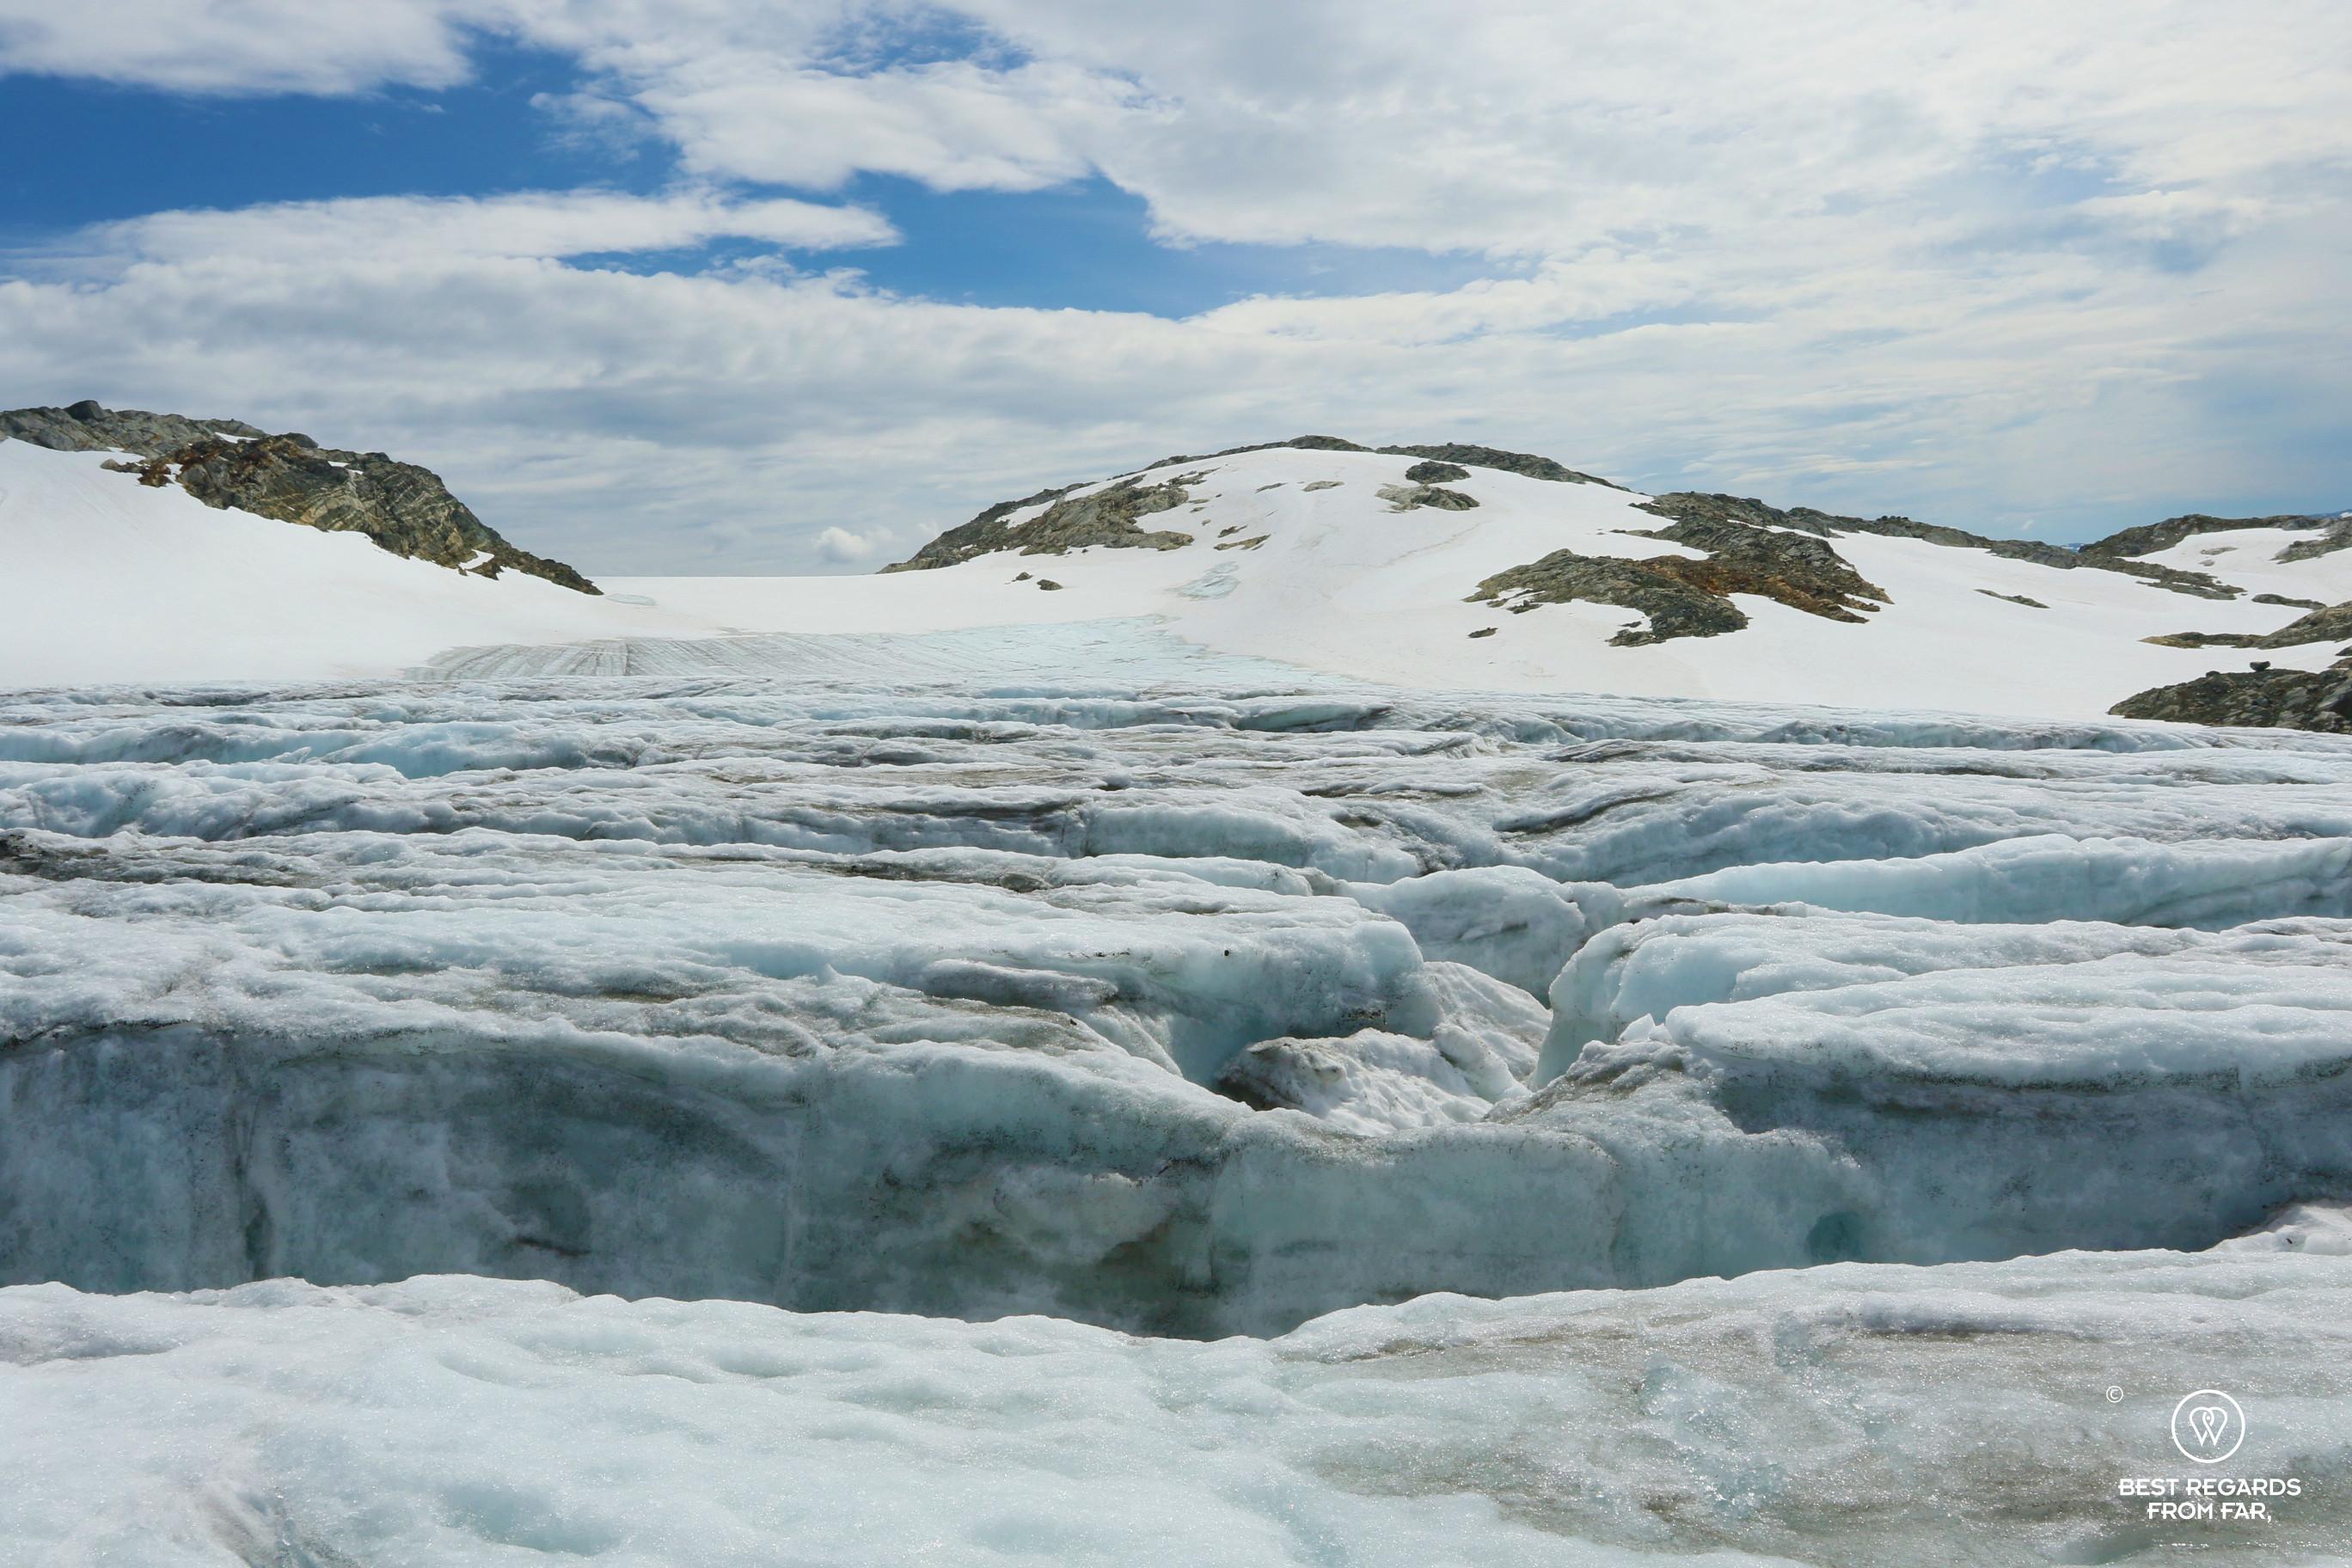 Crevasses of the Fonna Glacier